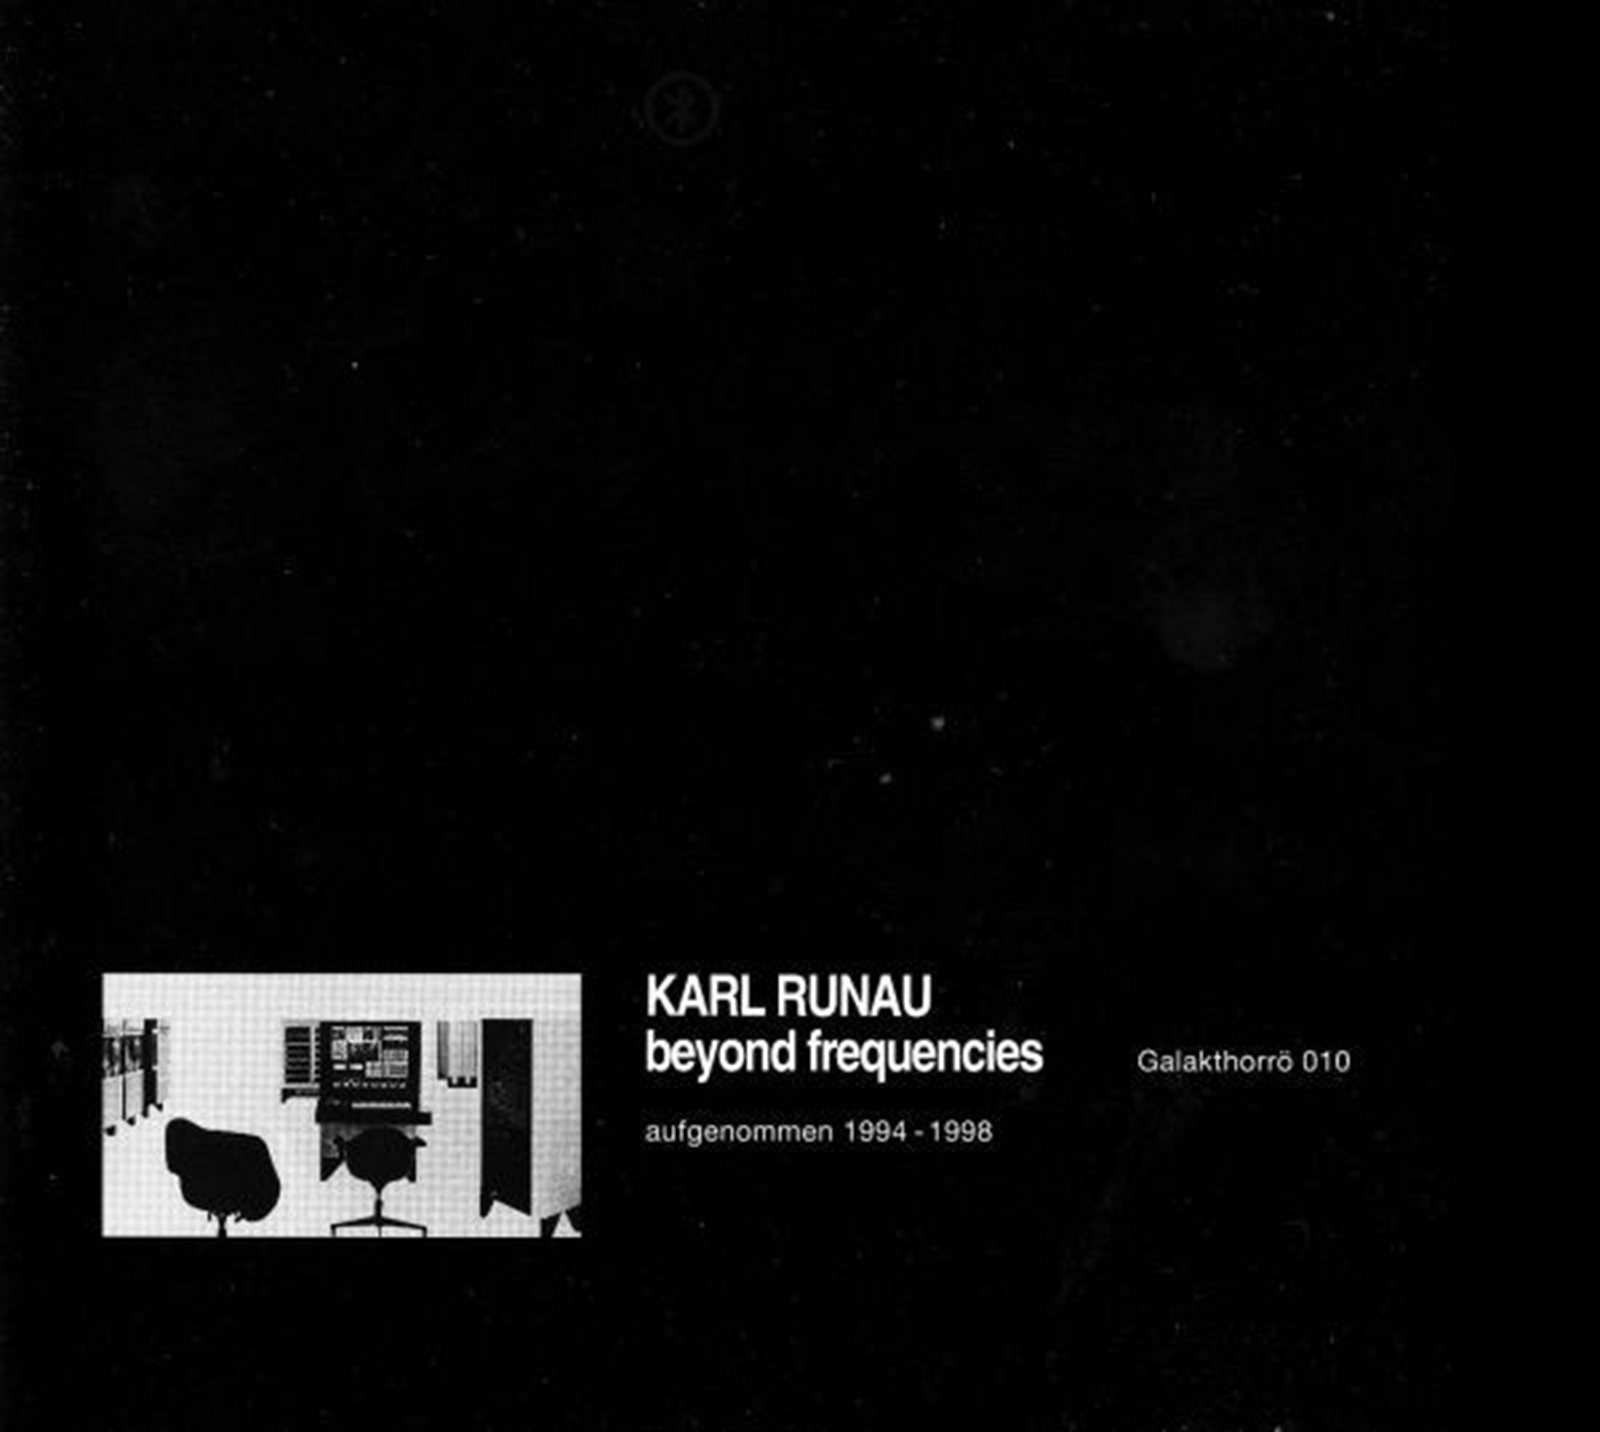 KARL RUNAU – BEYOND FREQUENCES (Galakthorrö – Galakthorrö 010, CD ALBUM, 2000) (FLAC)